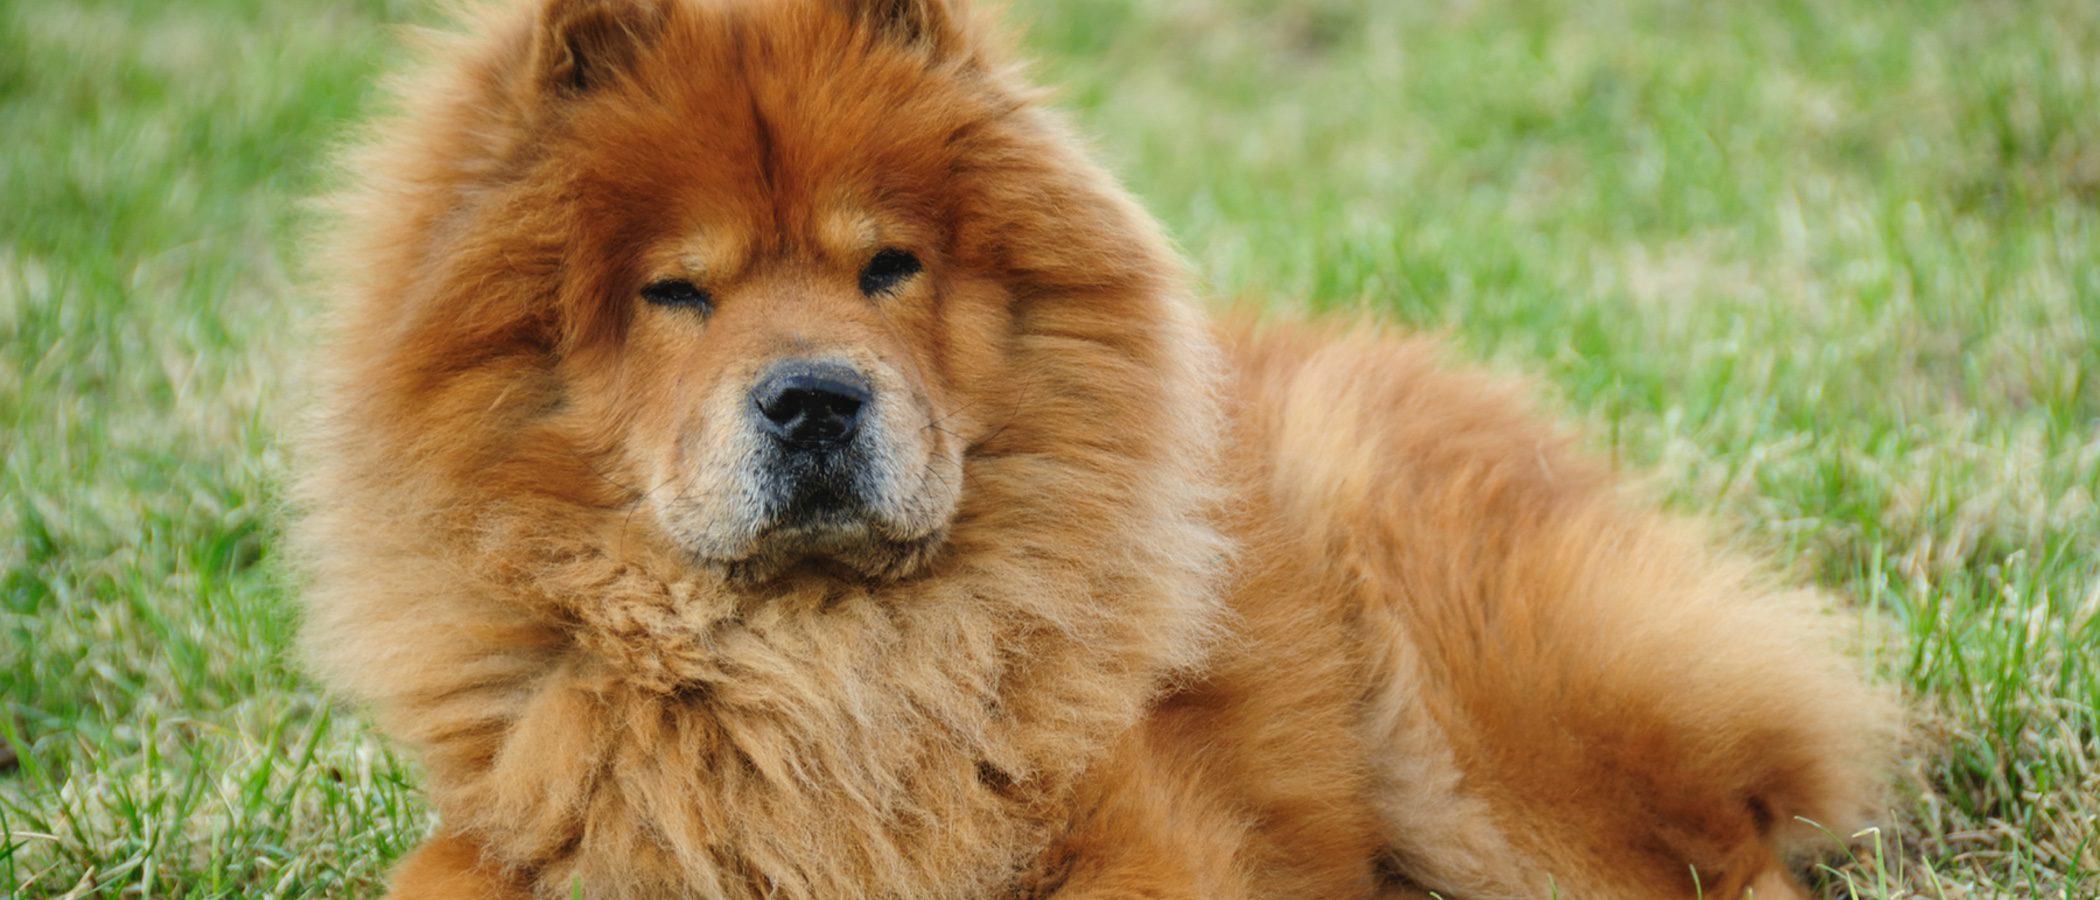 Razas de perros: Chow chow